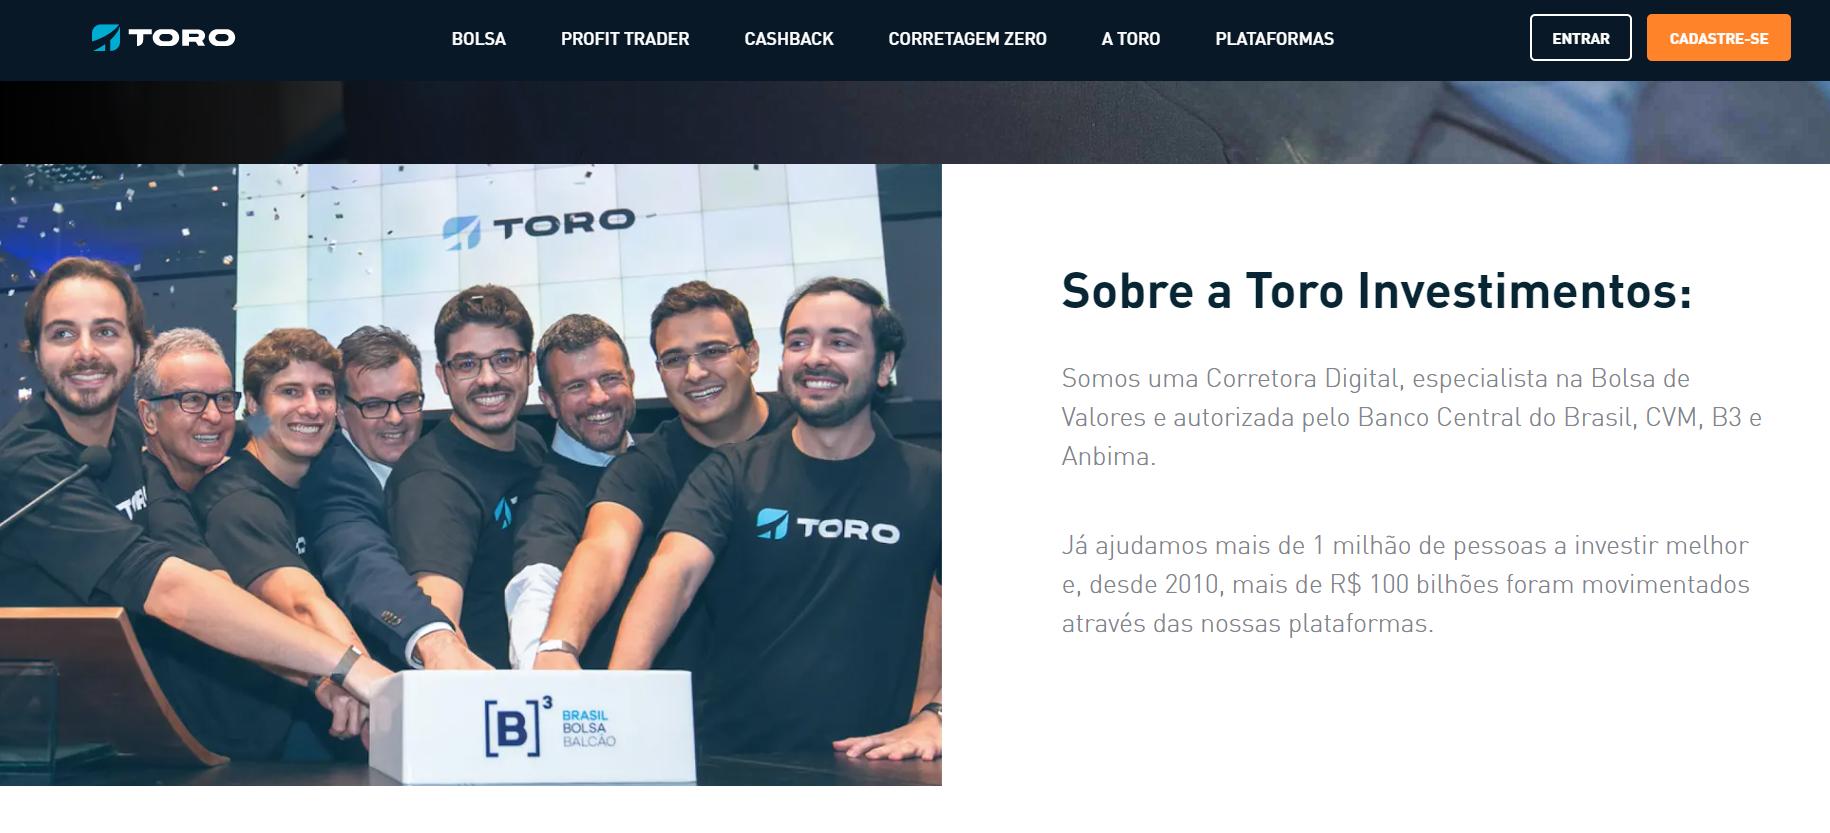 Santander compra o controle da corretora Toro